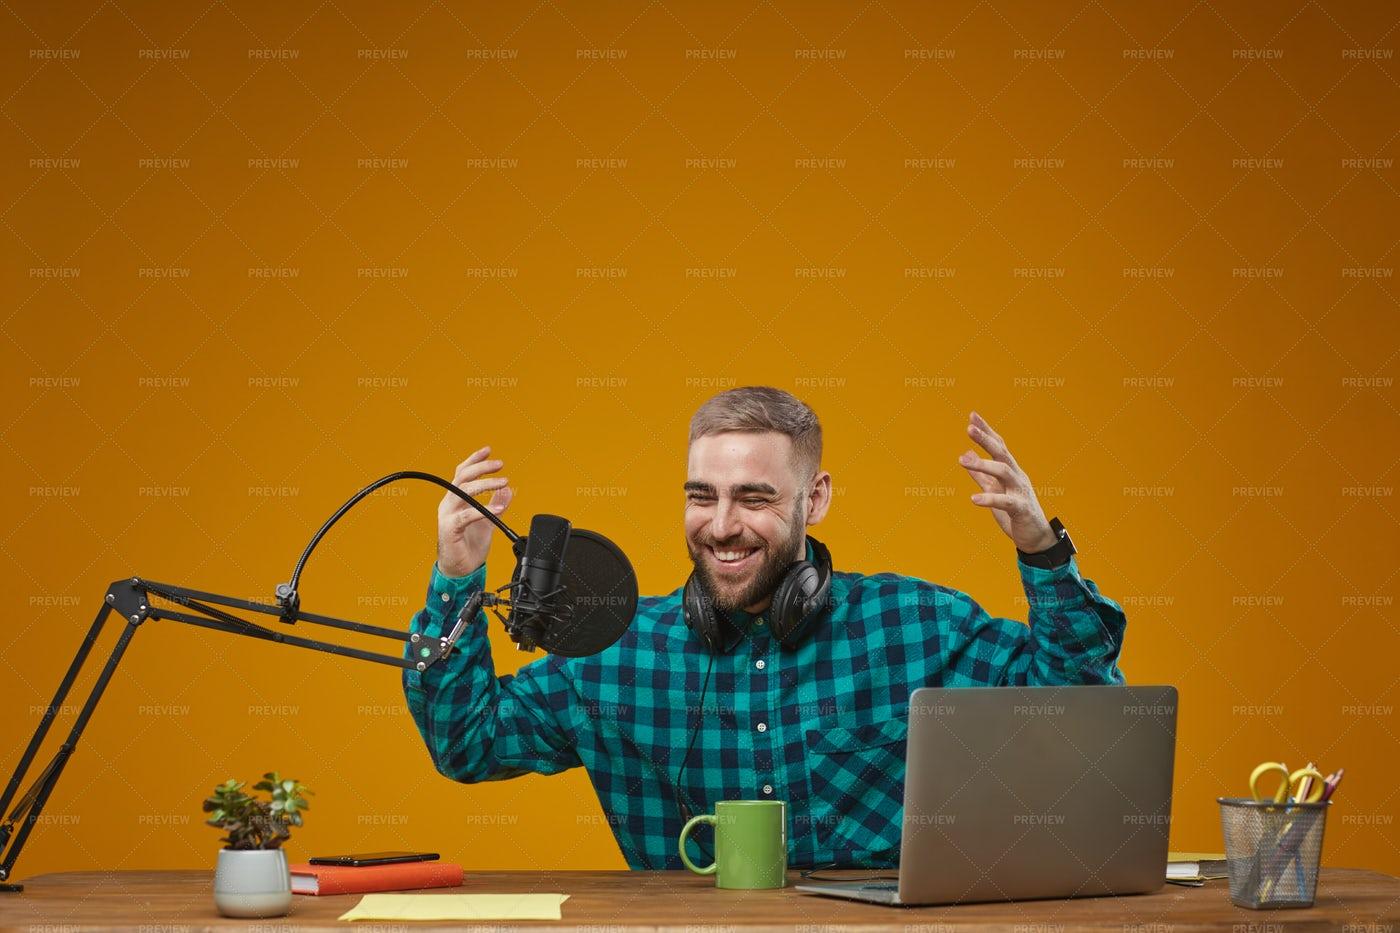 Joyful Radio Presenter Working: Stock Photos